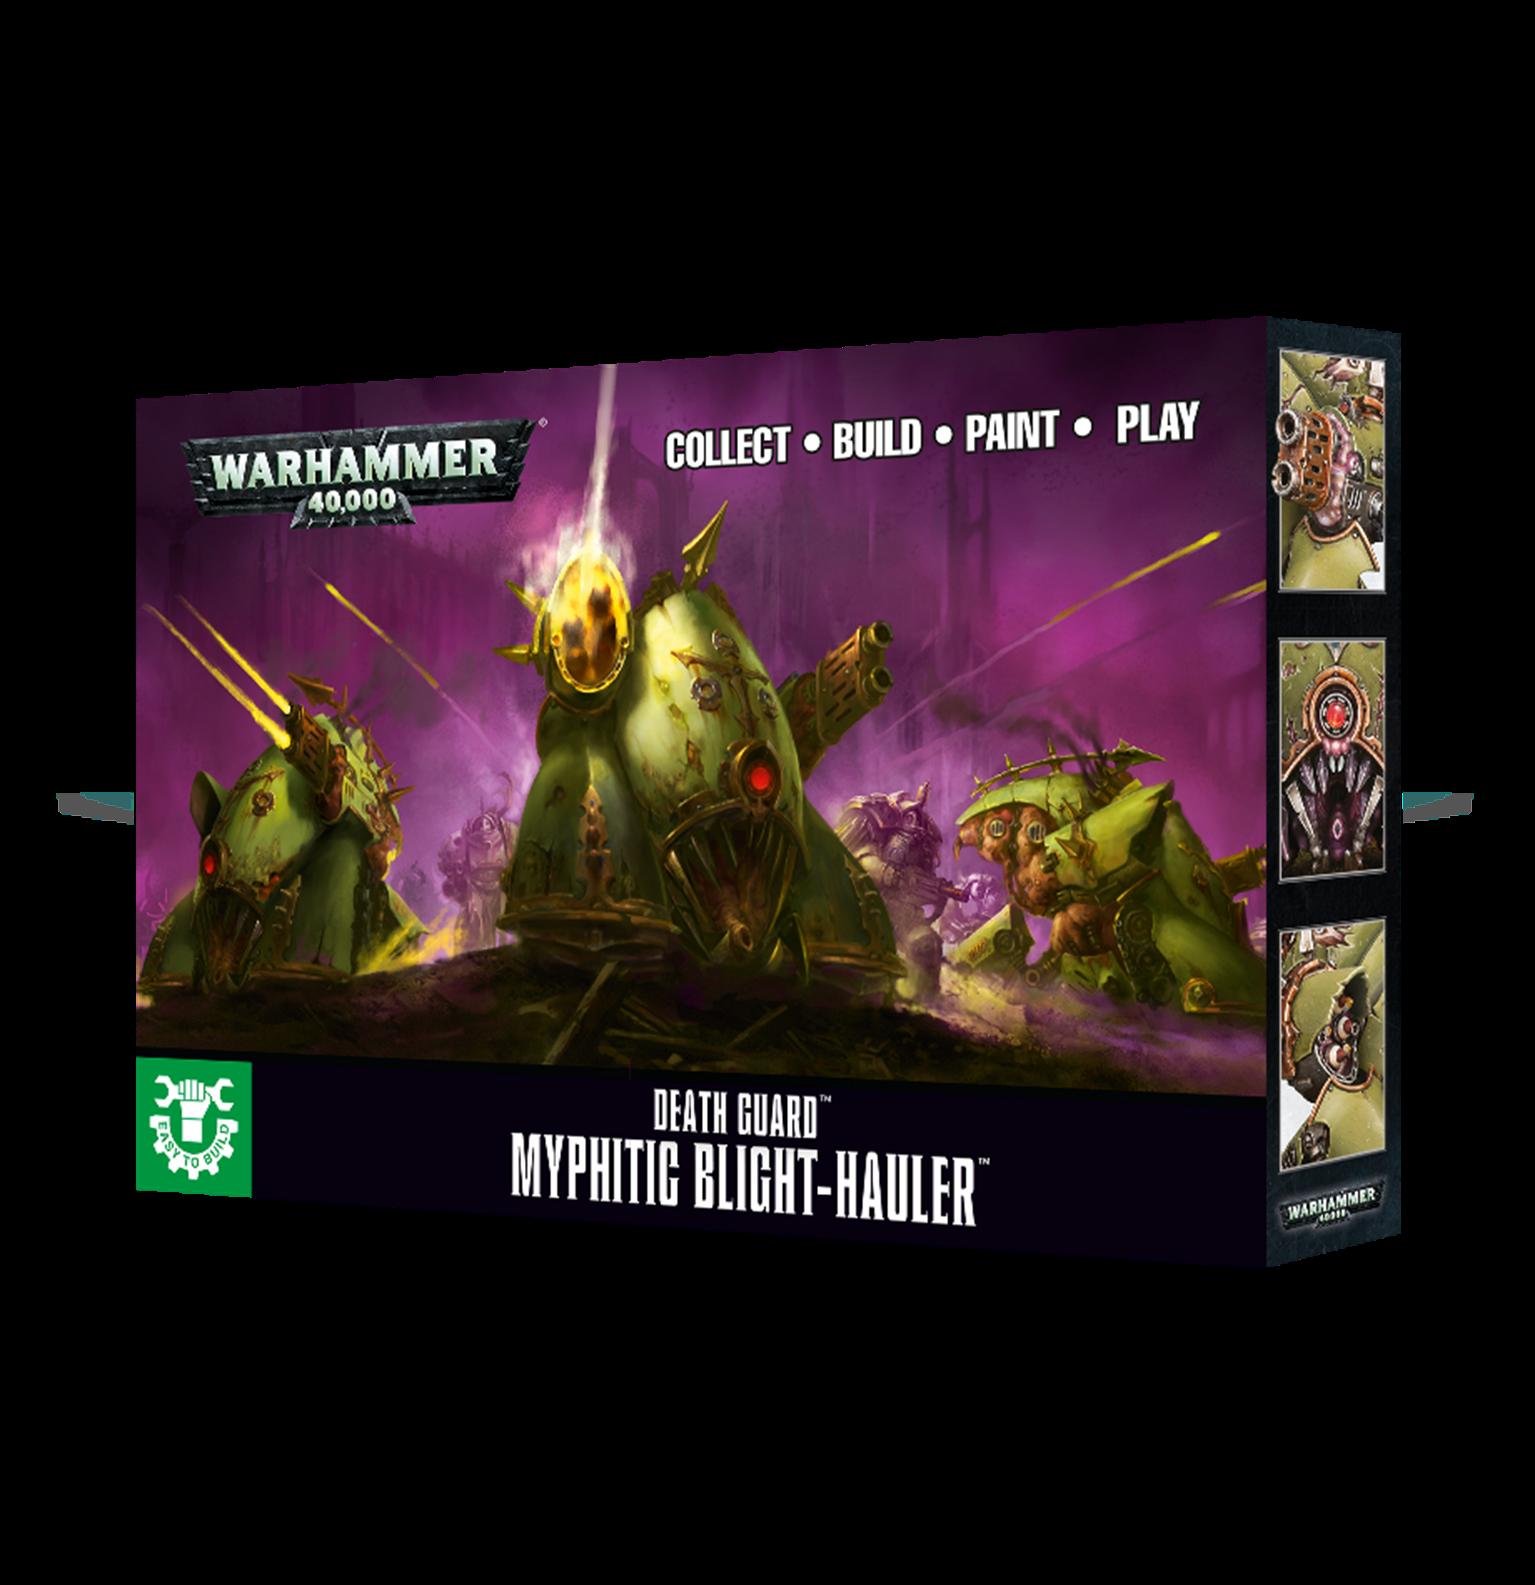 Warhammer 40,000 ETB Death Guard Myphitic Blight-Hauler